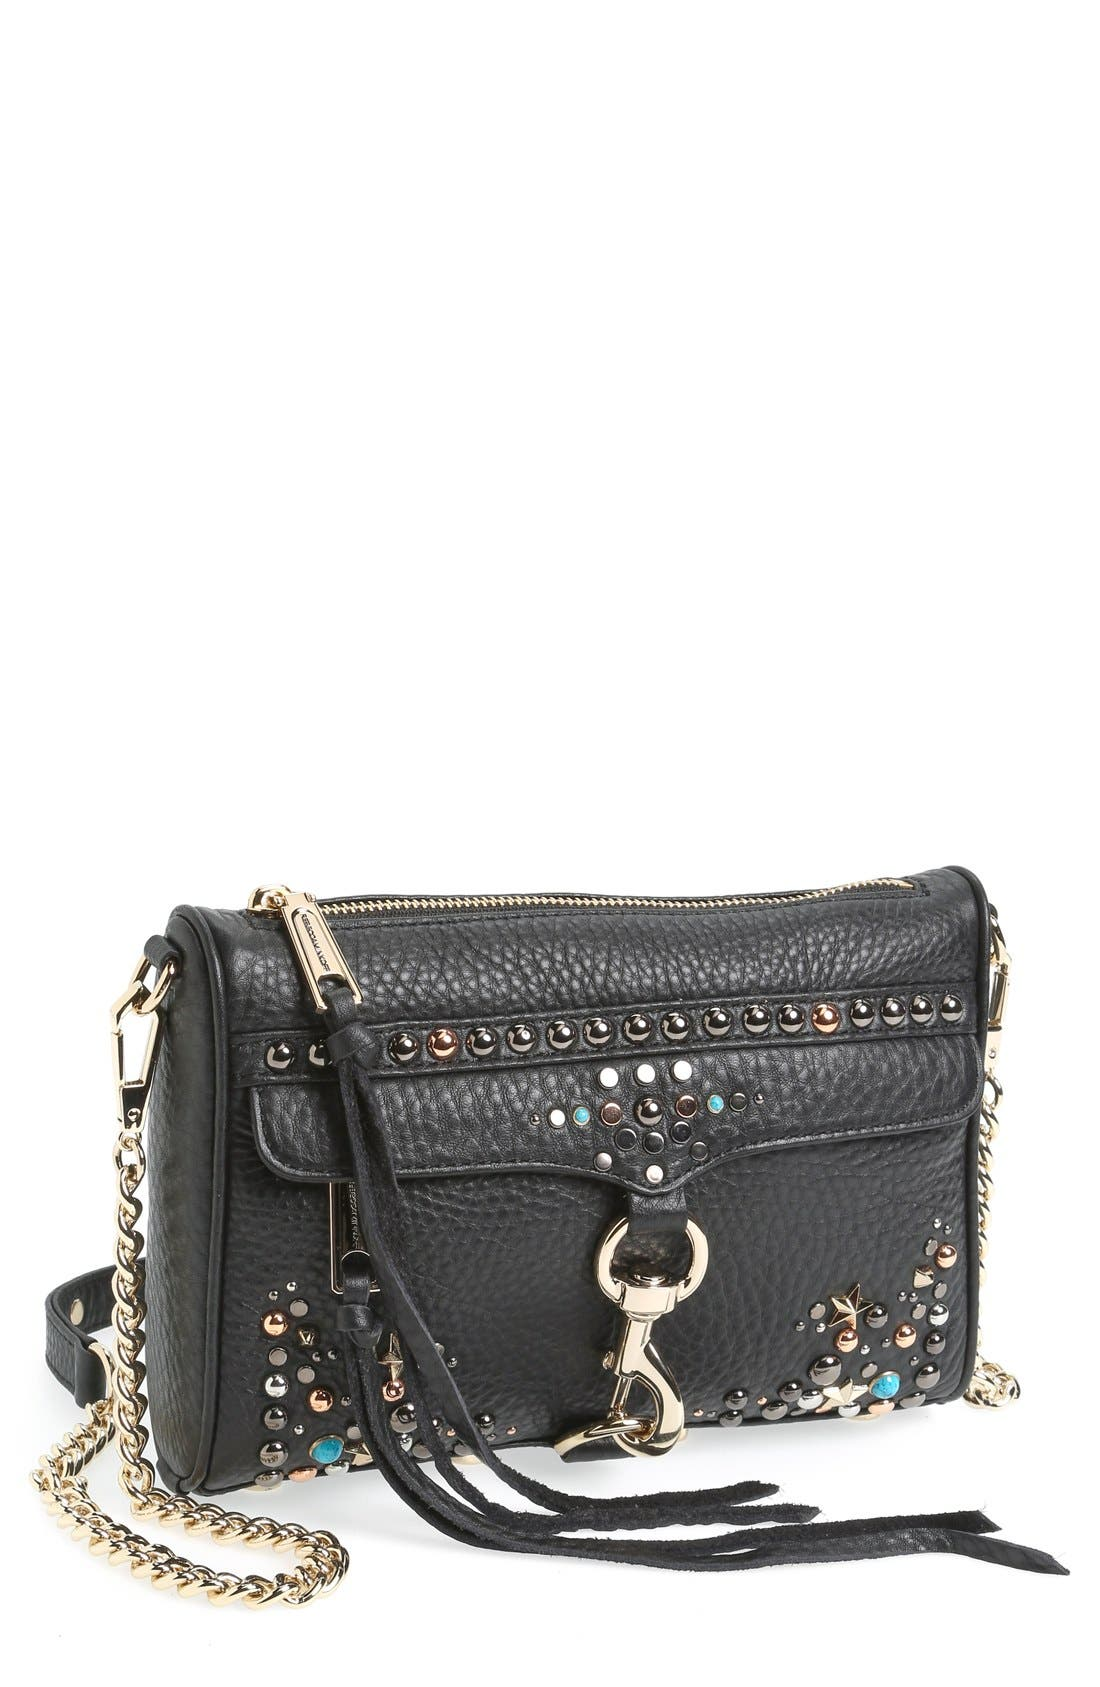 Alternate Image 1 Selected - Rebecca Minkoff 'Mini MAC - Austin' Studded Crossbody Bag